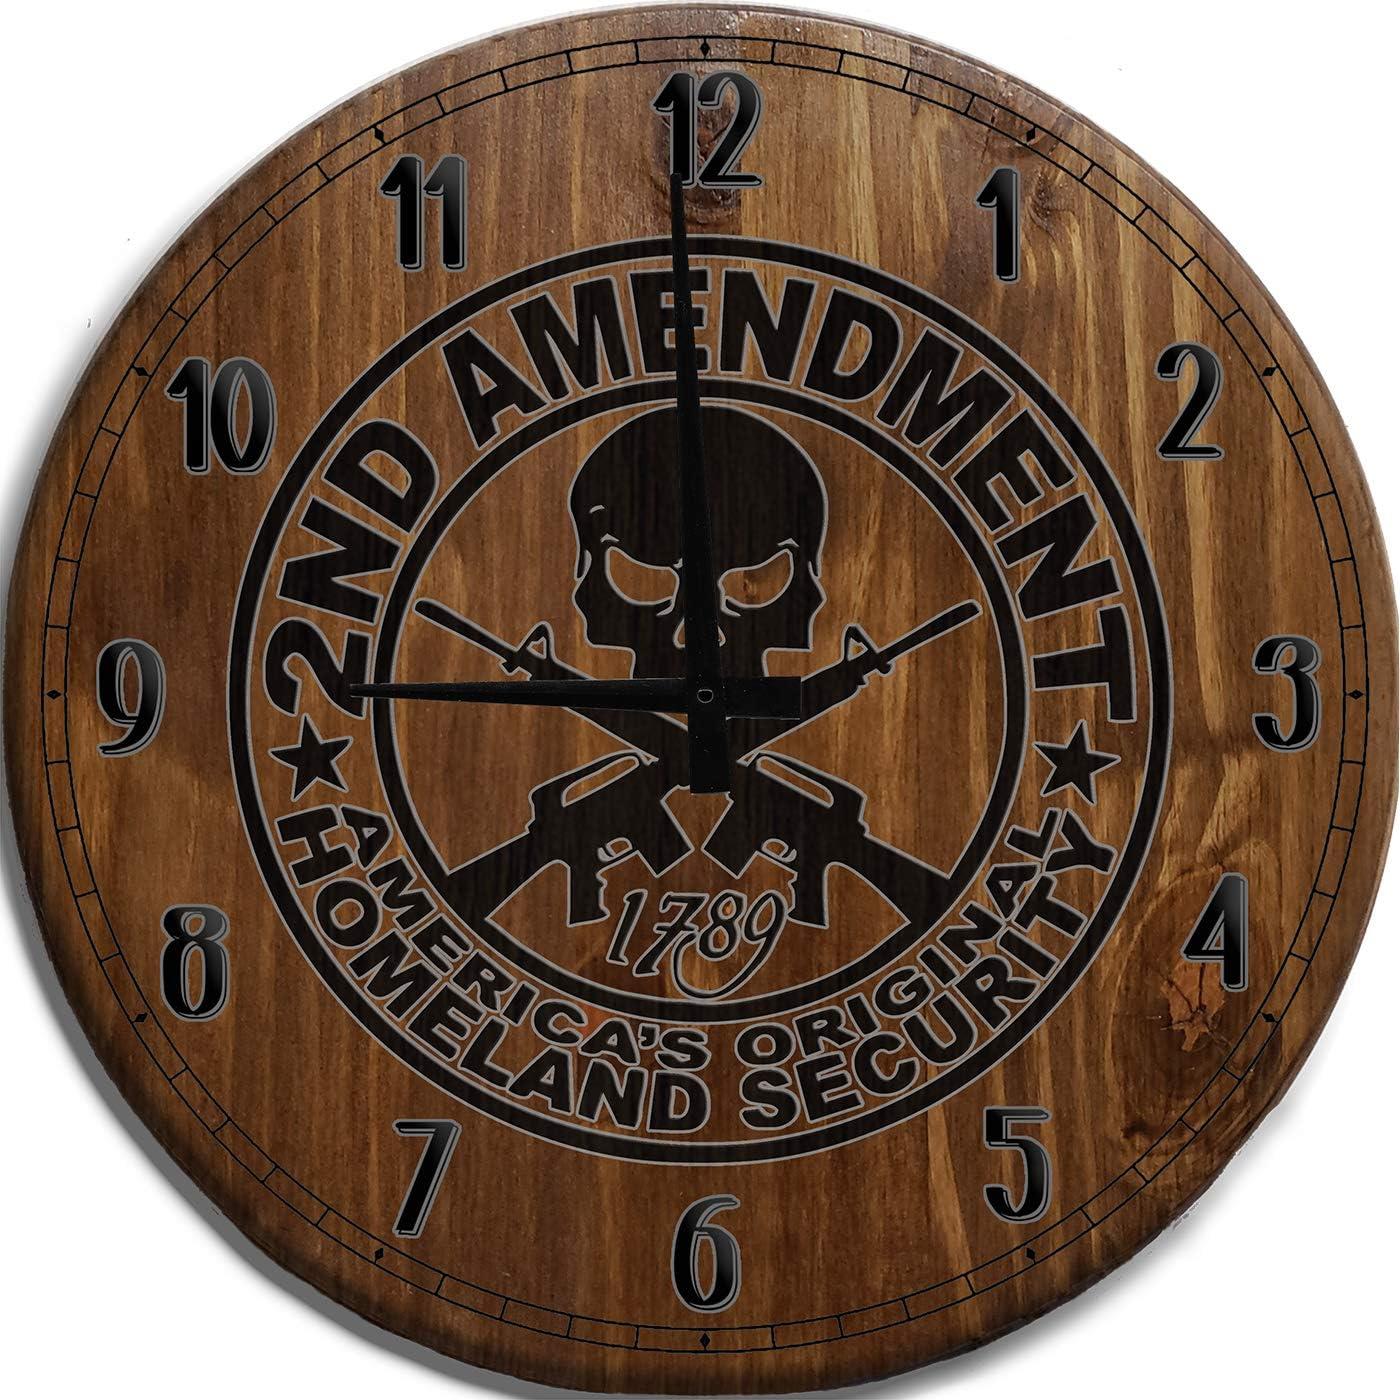 Mnk Max 60% OFF Large Wall Clock 24 Inch Amendment 2nd Original Seasonal Wrap Introduction America's Ho